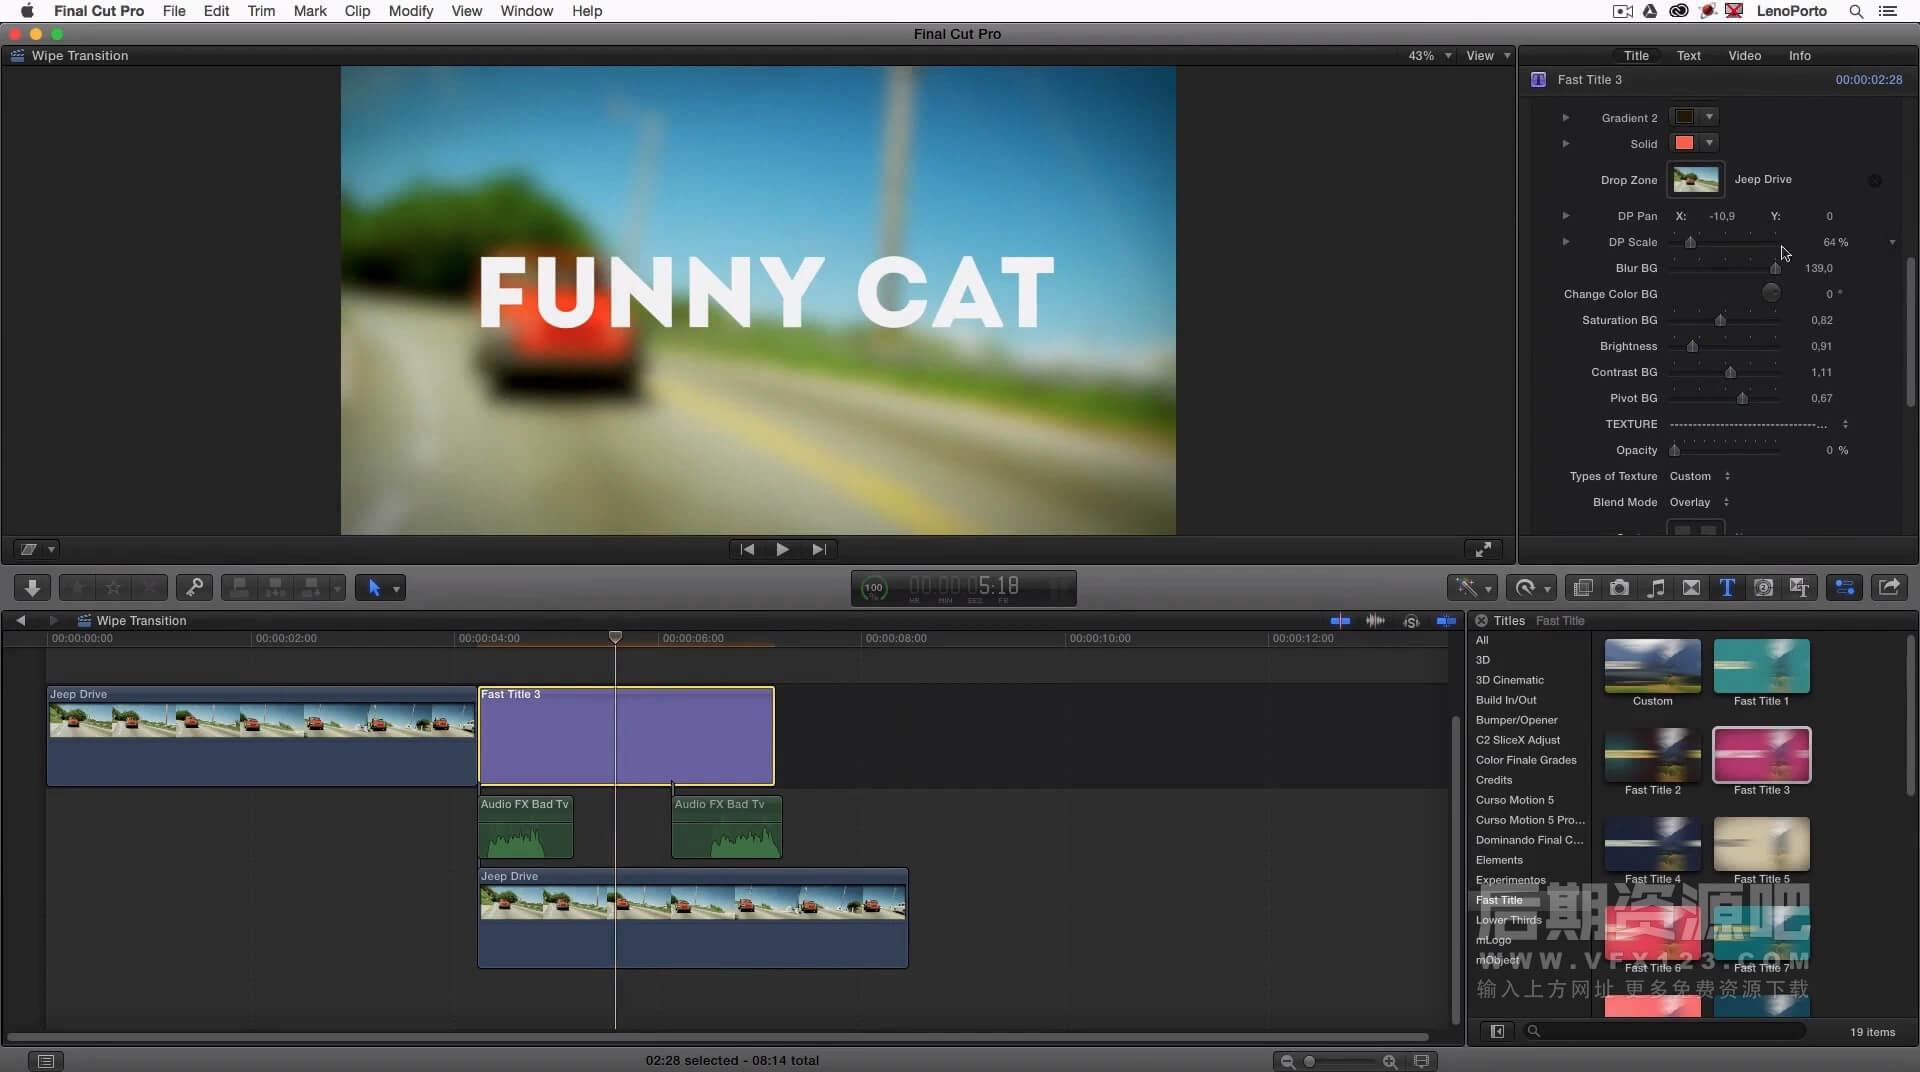 FCPX标题插件 19组快闪推拉切入效果 Vlog常用标题模板  Fast Title